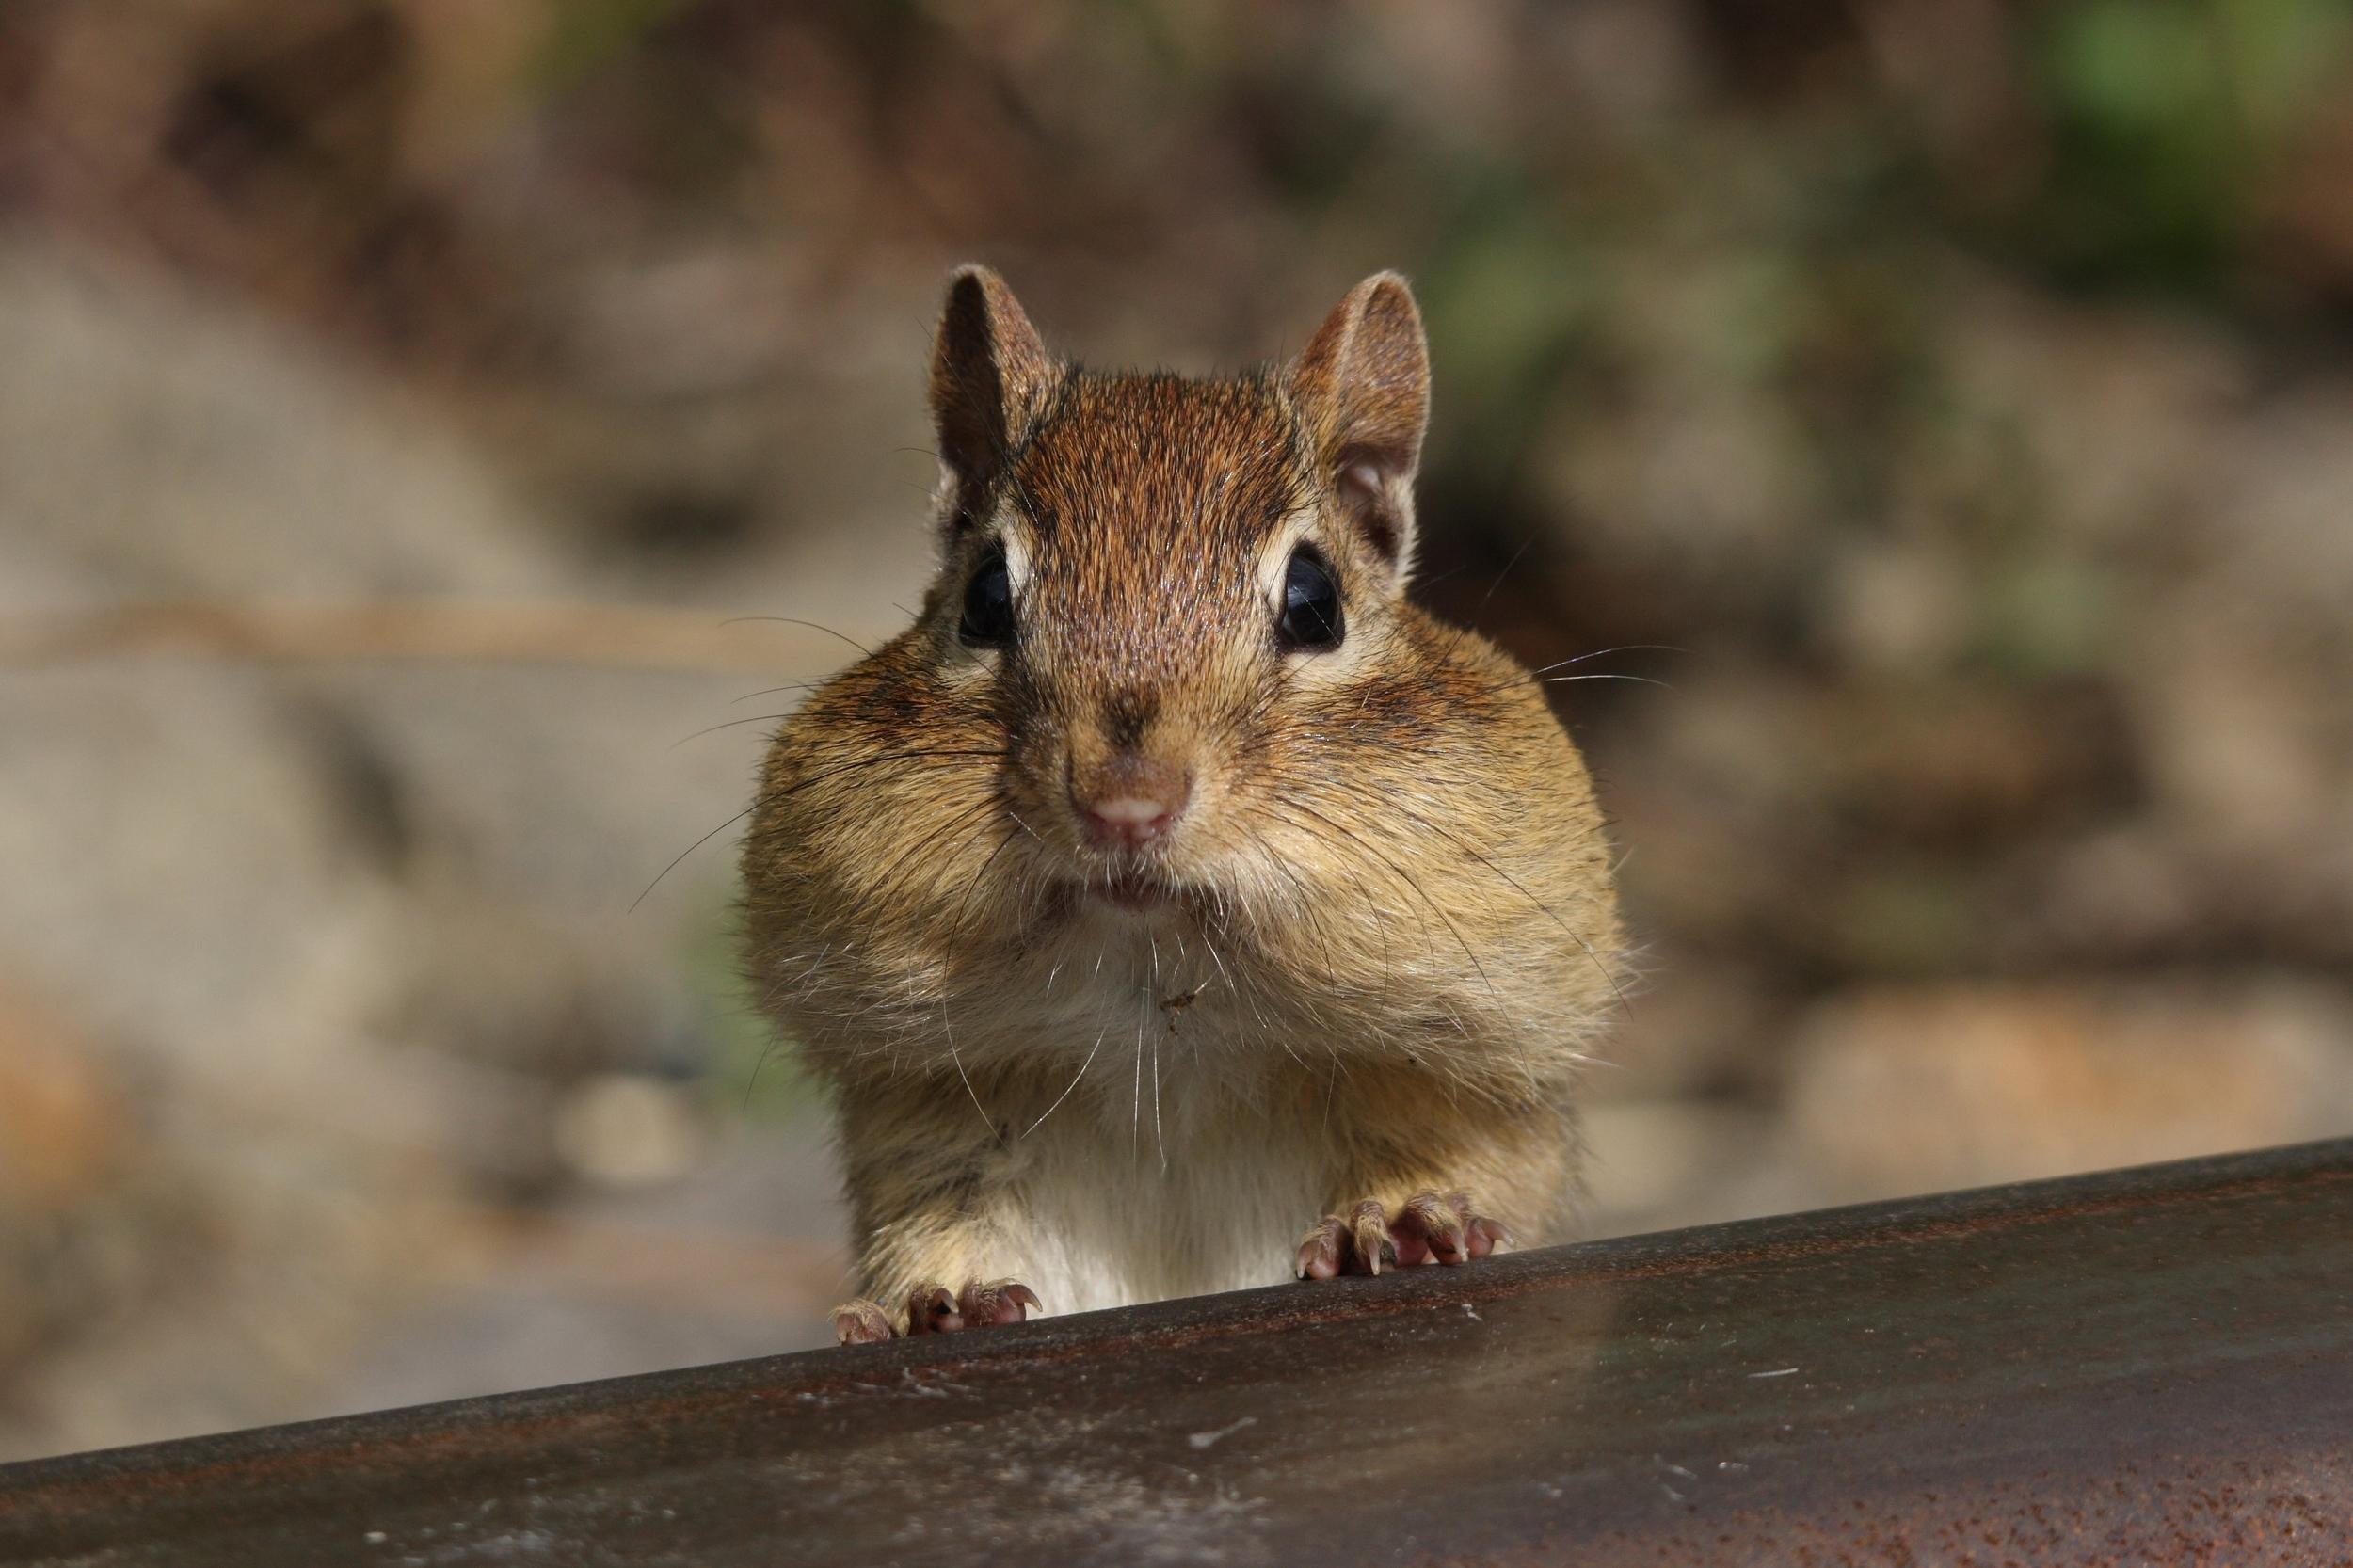 Squirrel with Nut.jpg